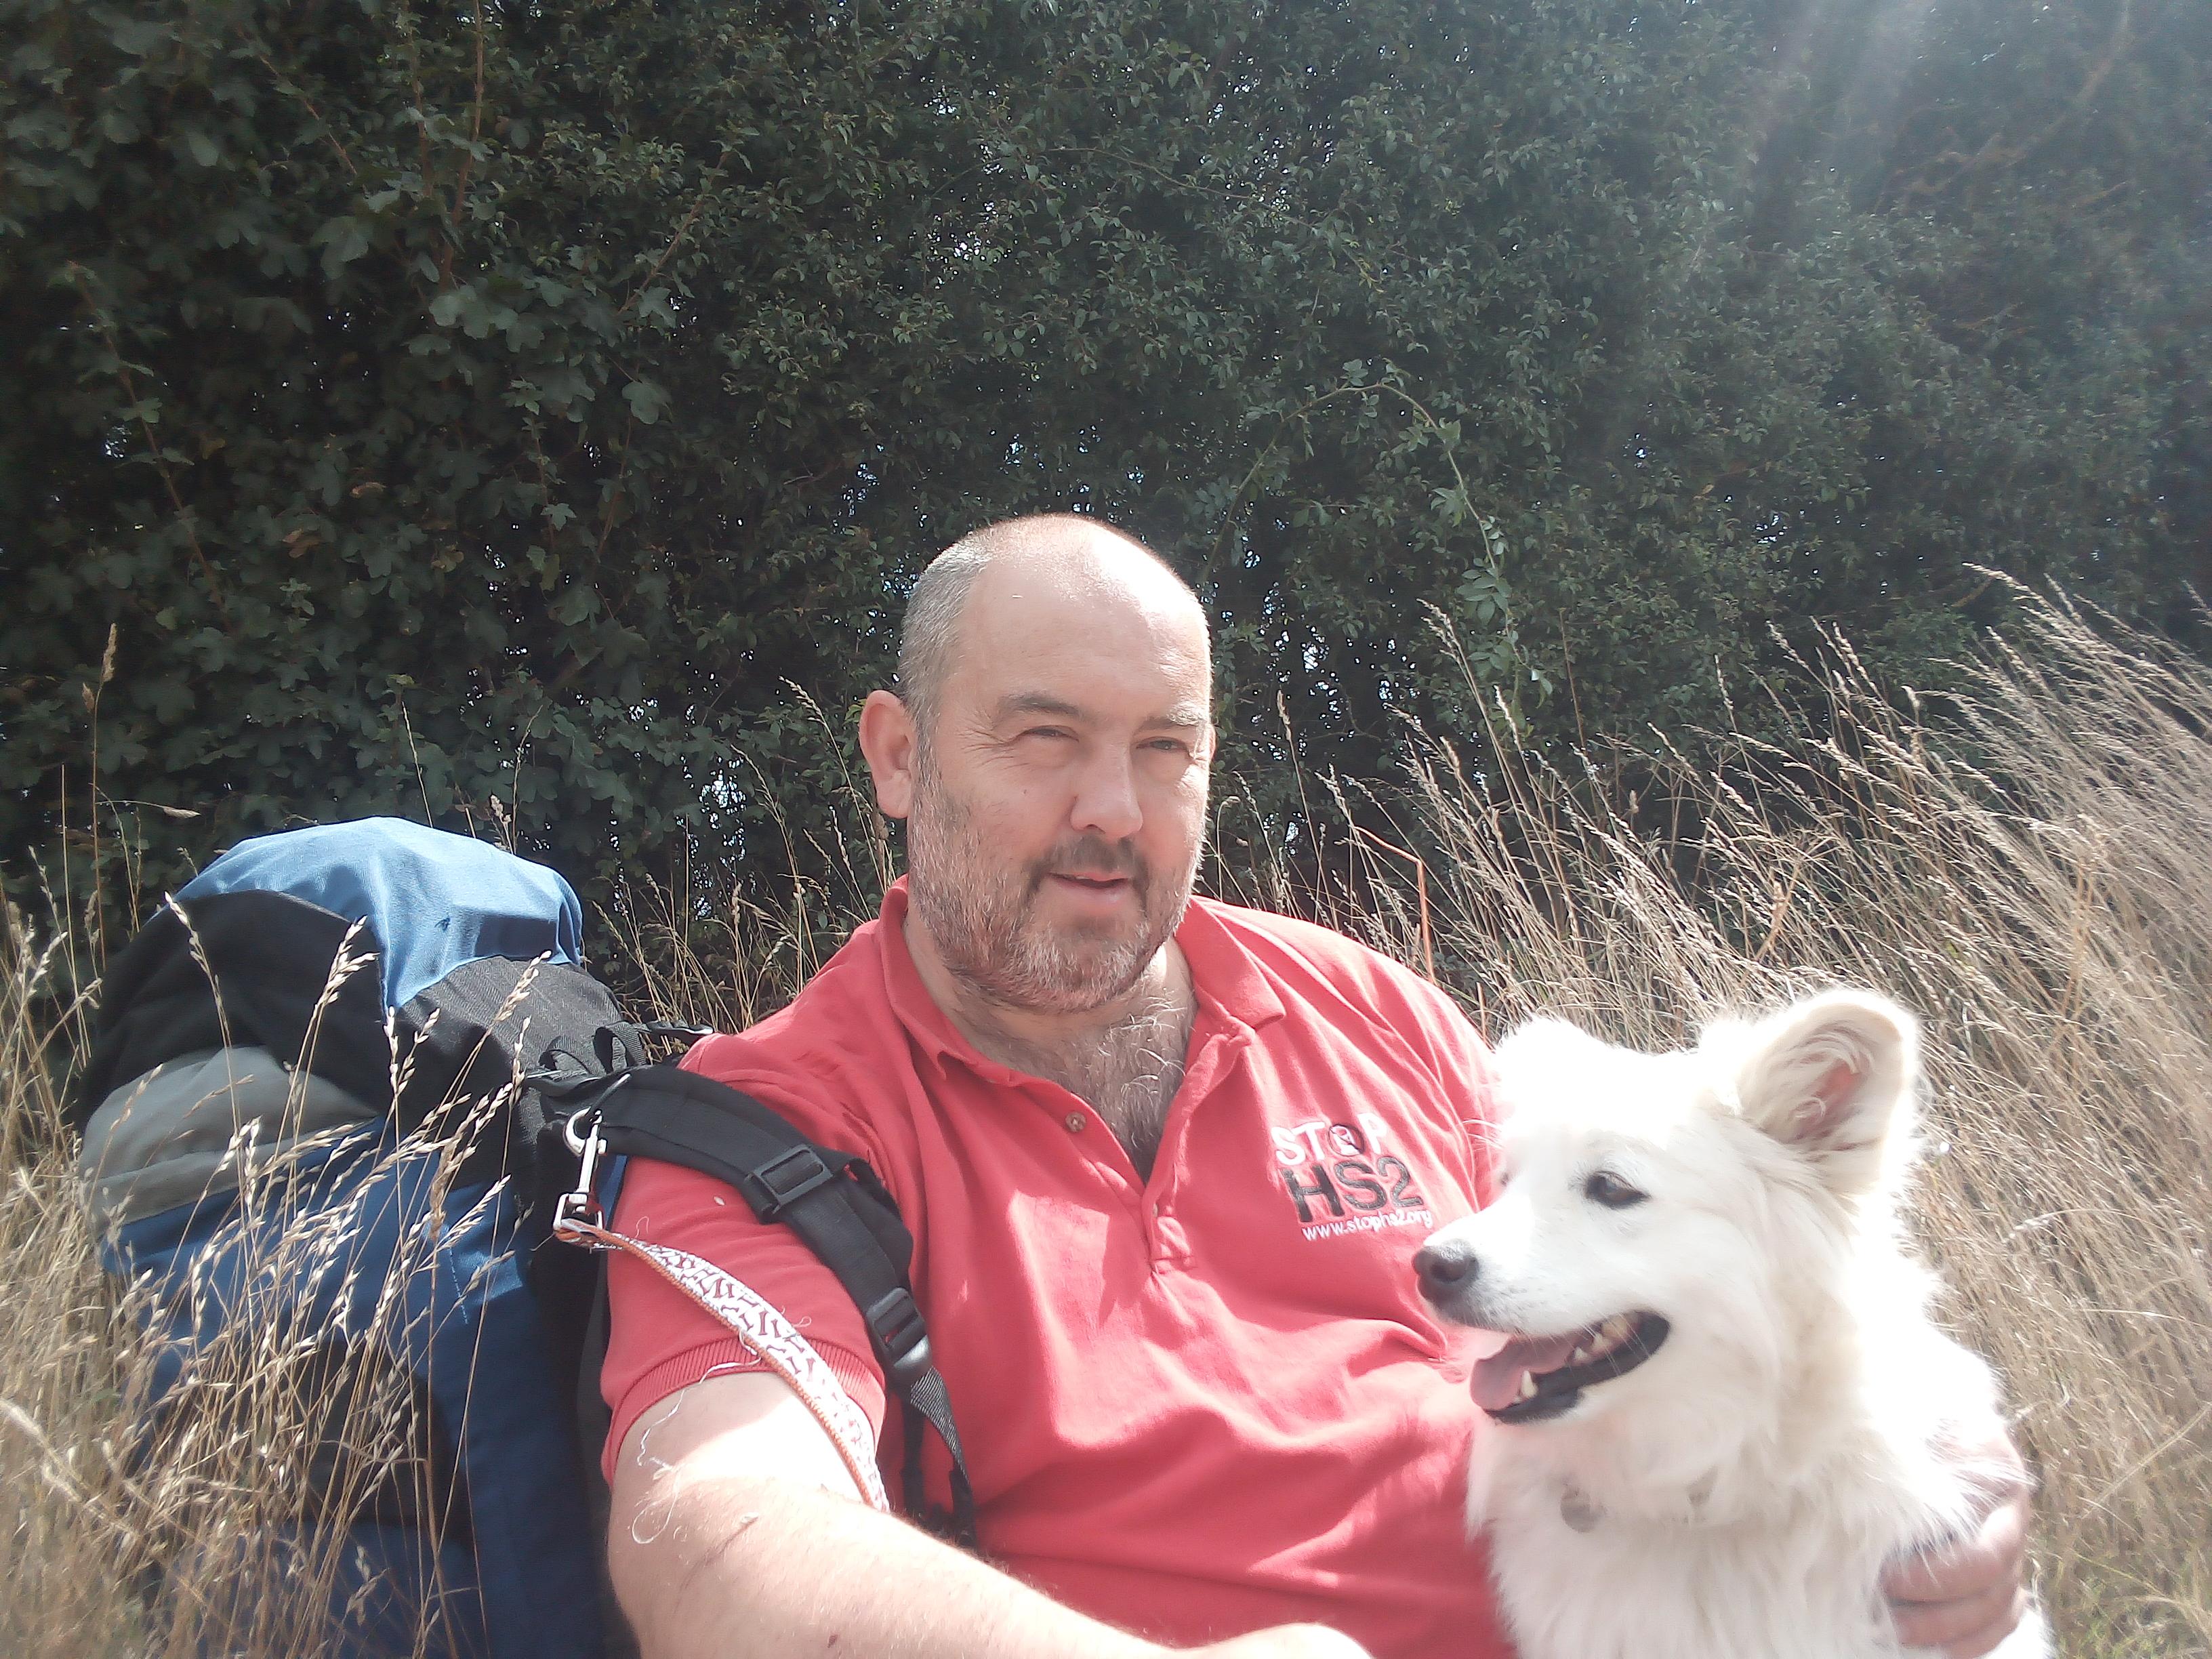 Joe Rukin and Eevie the dog